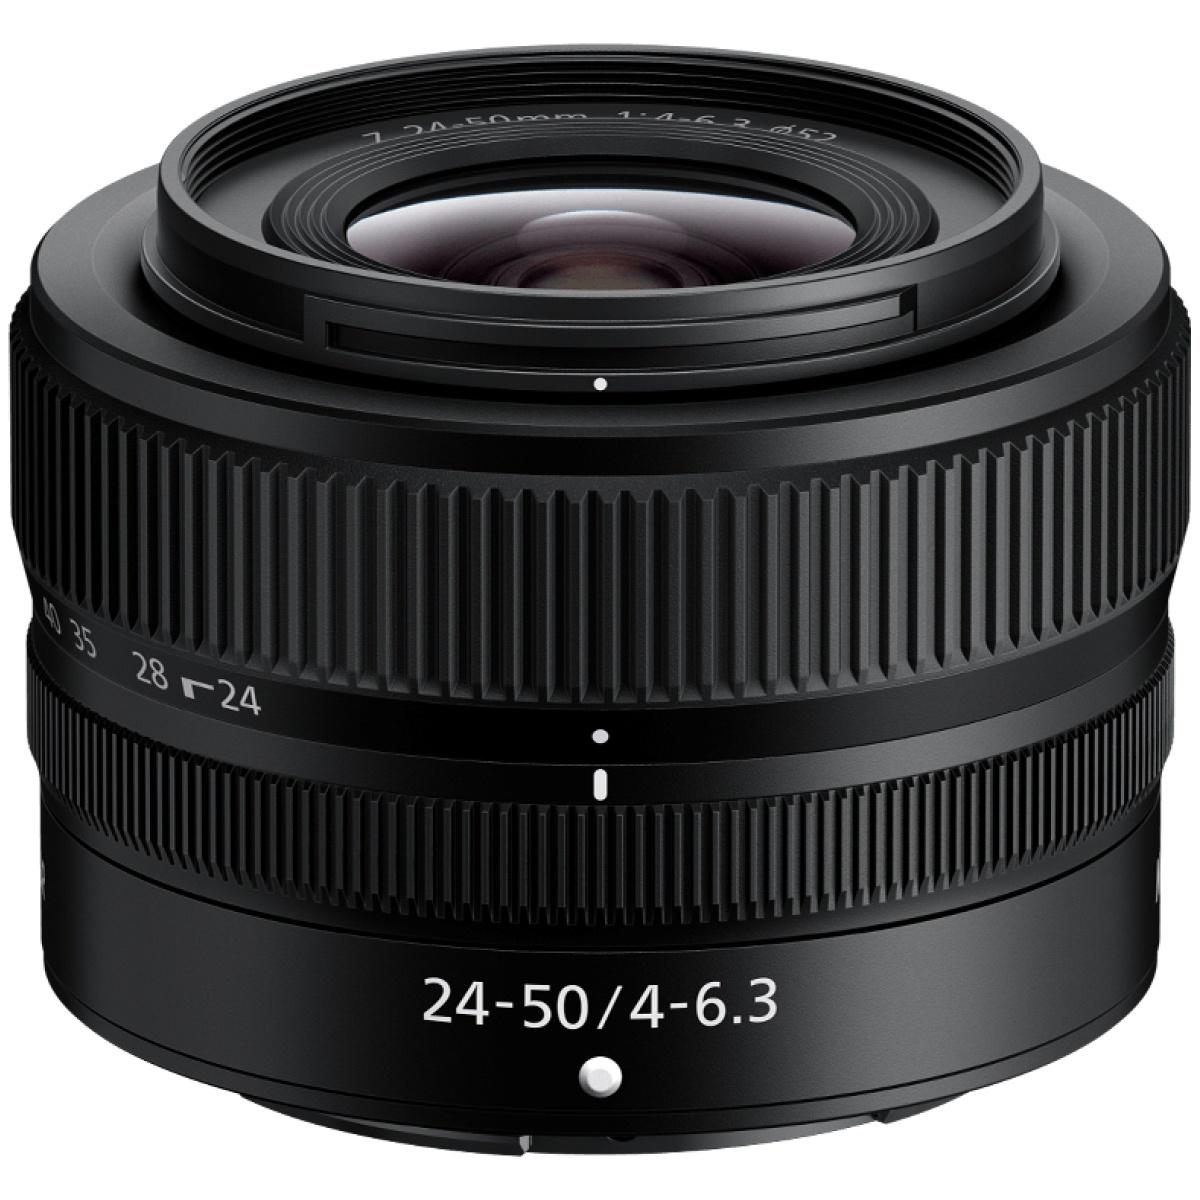 Nikon 24-50 mm 1:4,0-6,3 Z